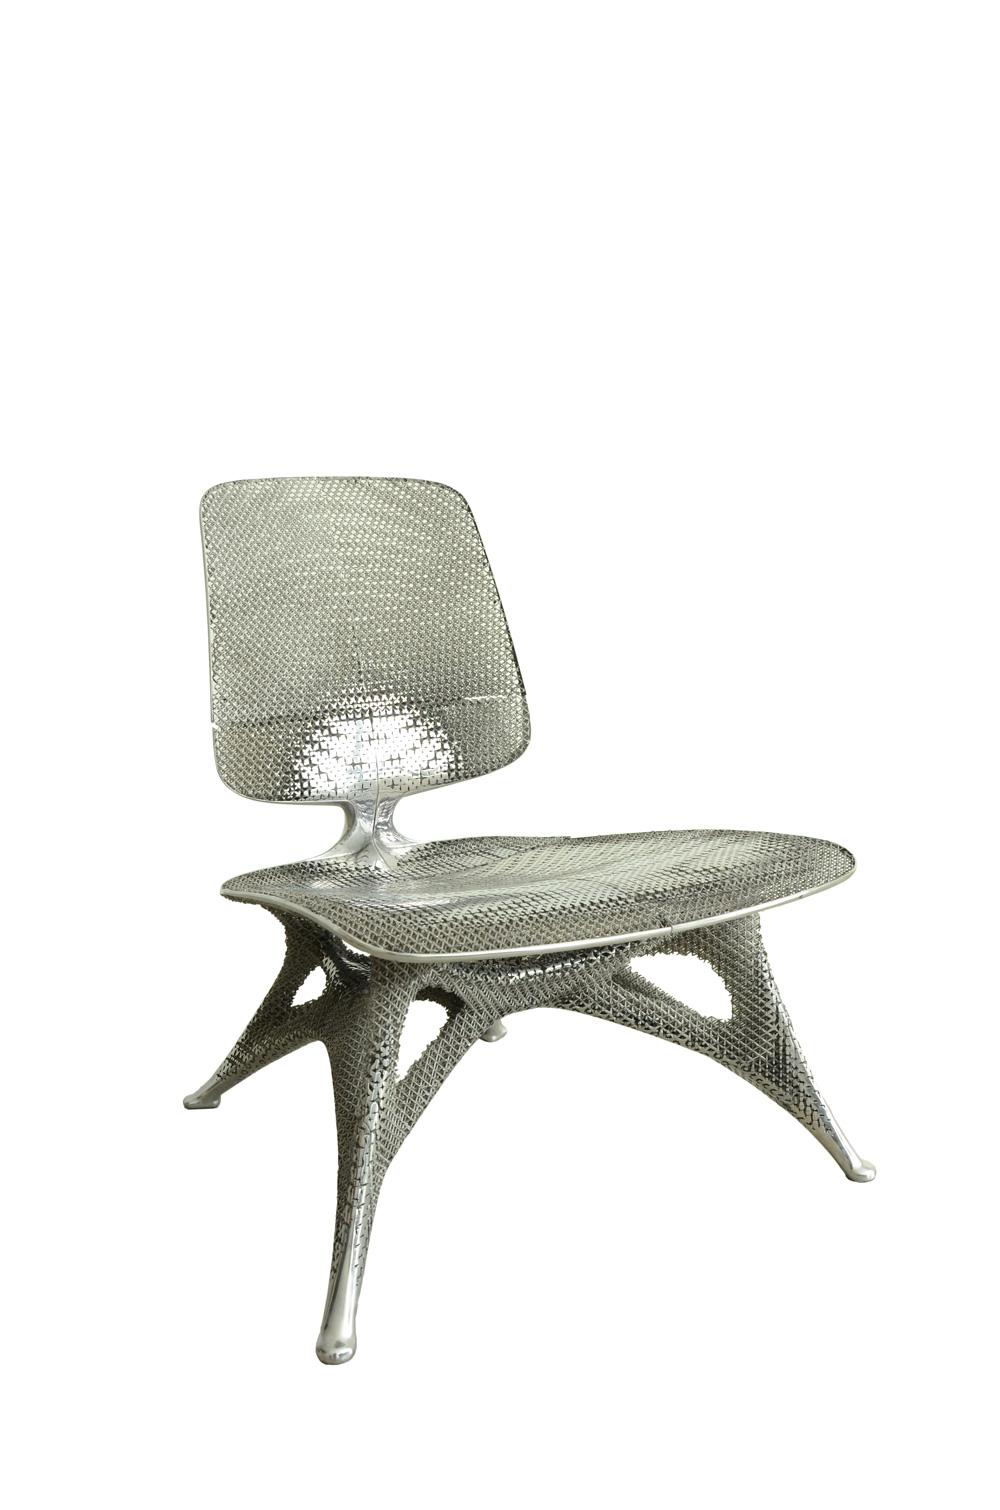 Aluminium Gradient Chair, Joris Laarman, 2014